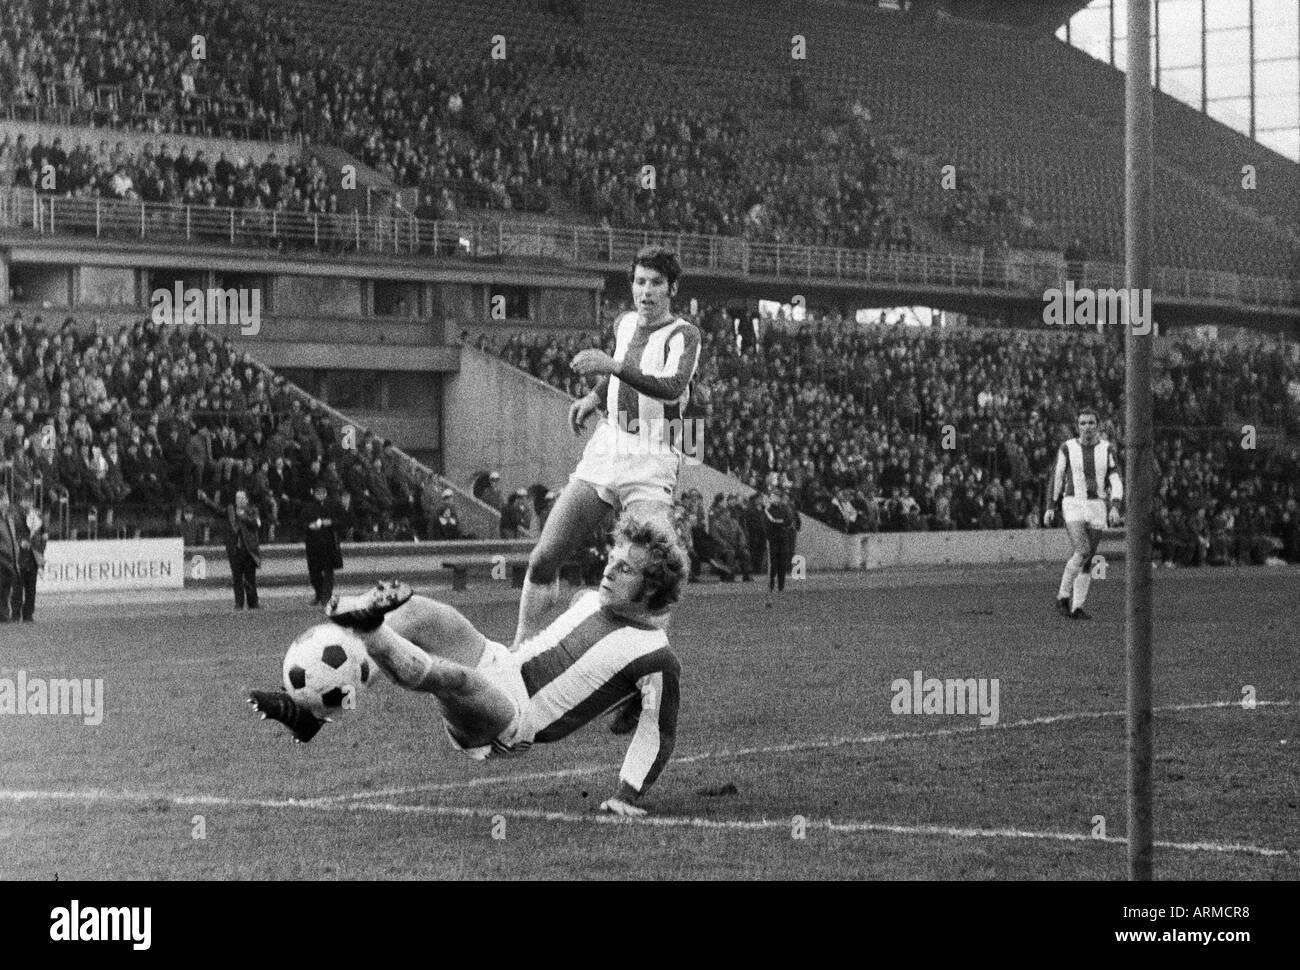 football, DFB Cup, eighth final, 1970/1971, Wedau Stadium in Duisburg, MSV Duisburg versus Tasmania 1900 Berlin 2:0, scene of the match, clearance by Franz Emans (Berlin) - Stock Image